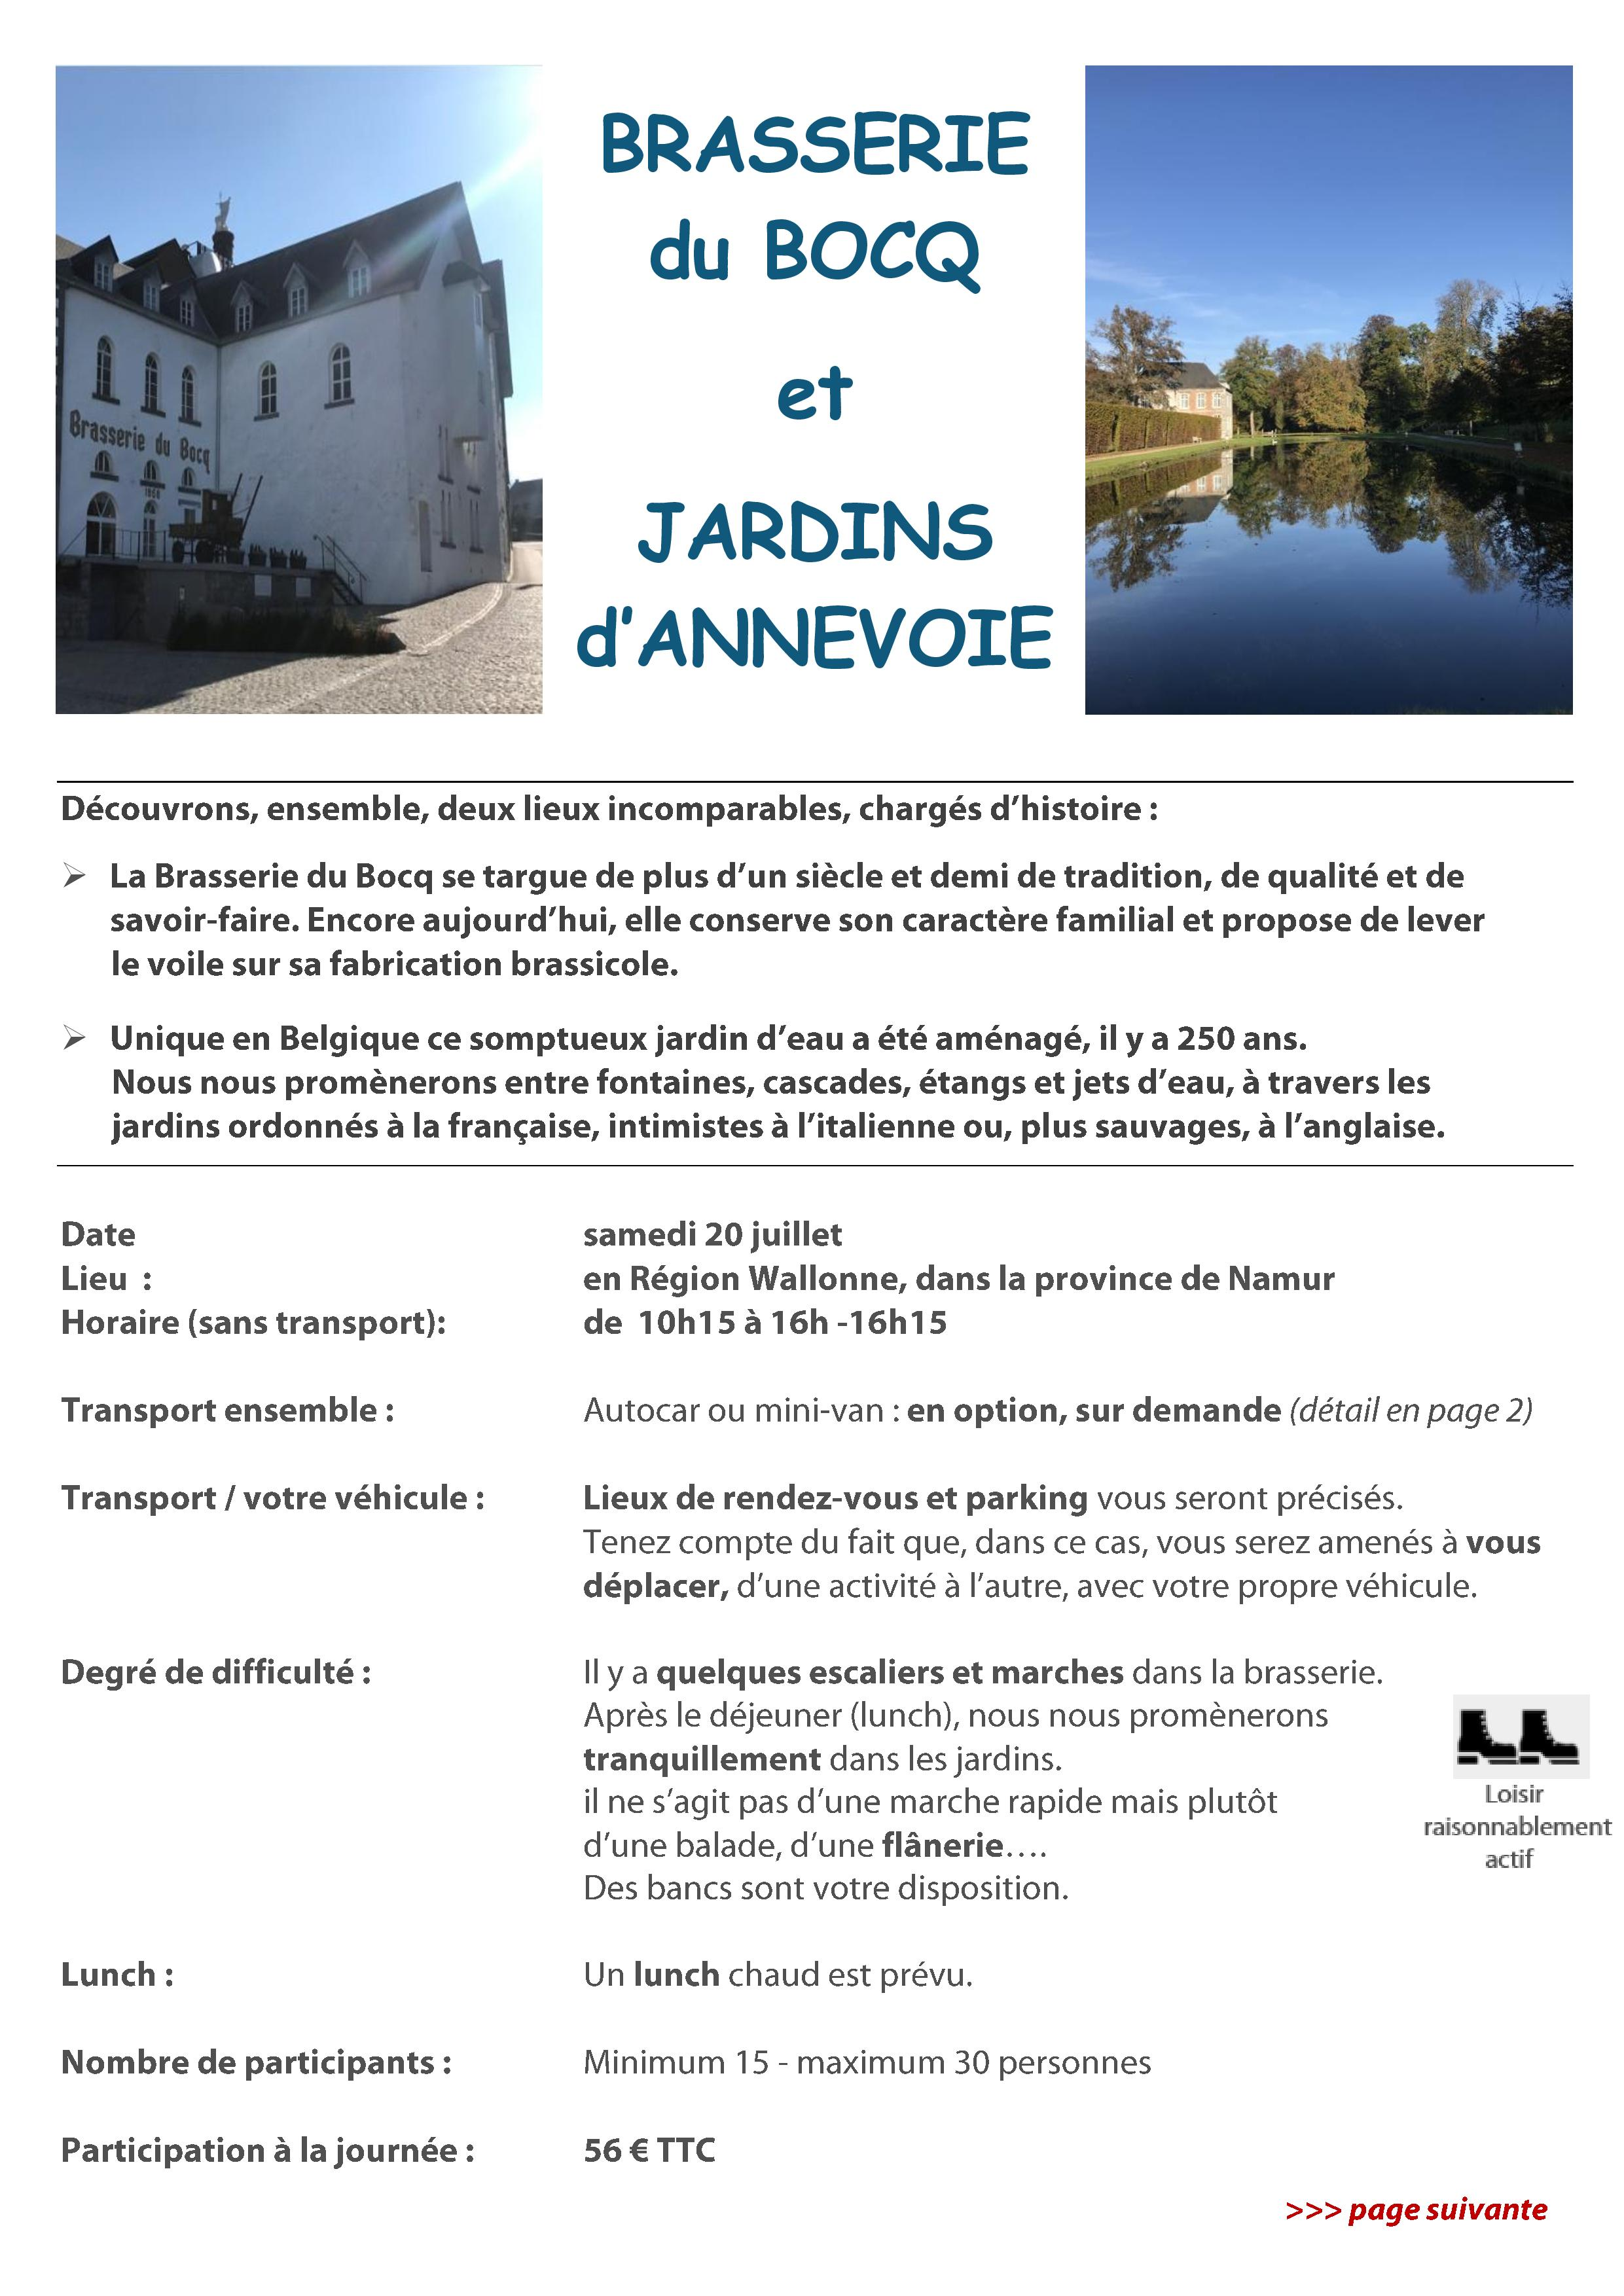 Brasserie du Bocq et Jardins d'Annevoie